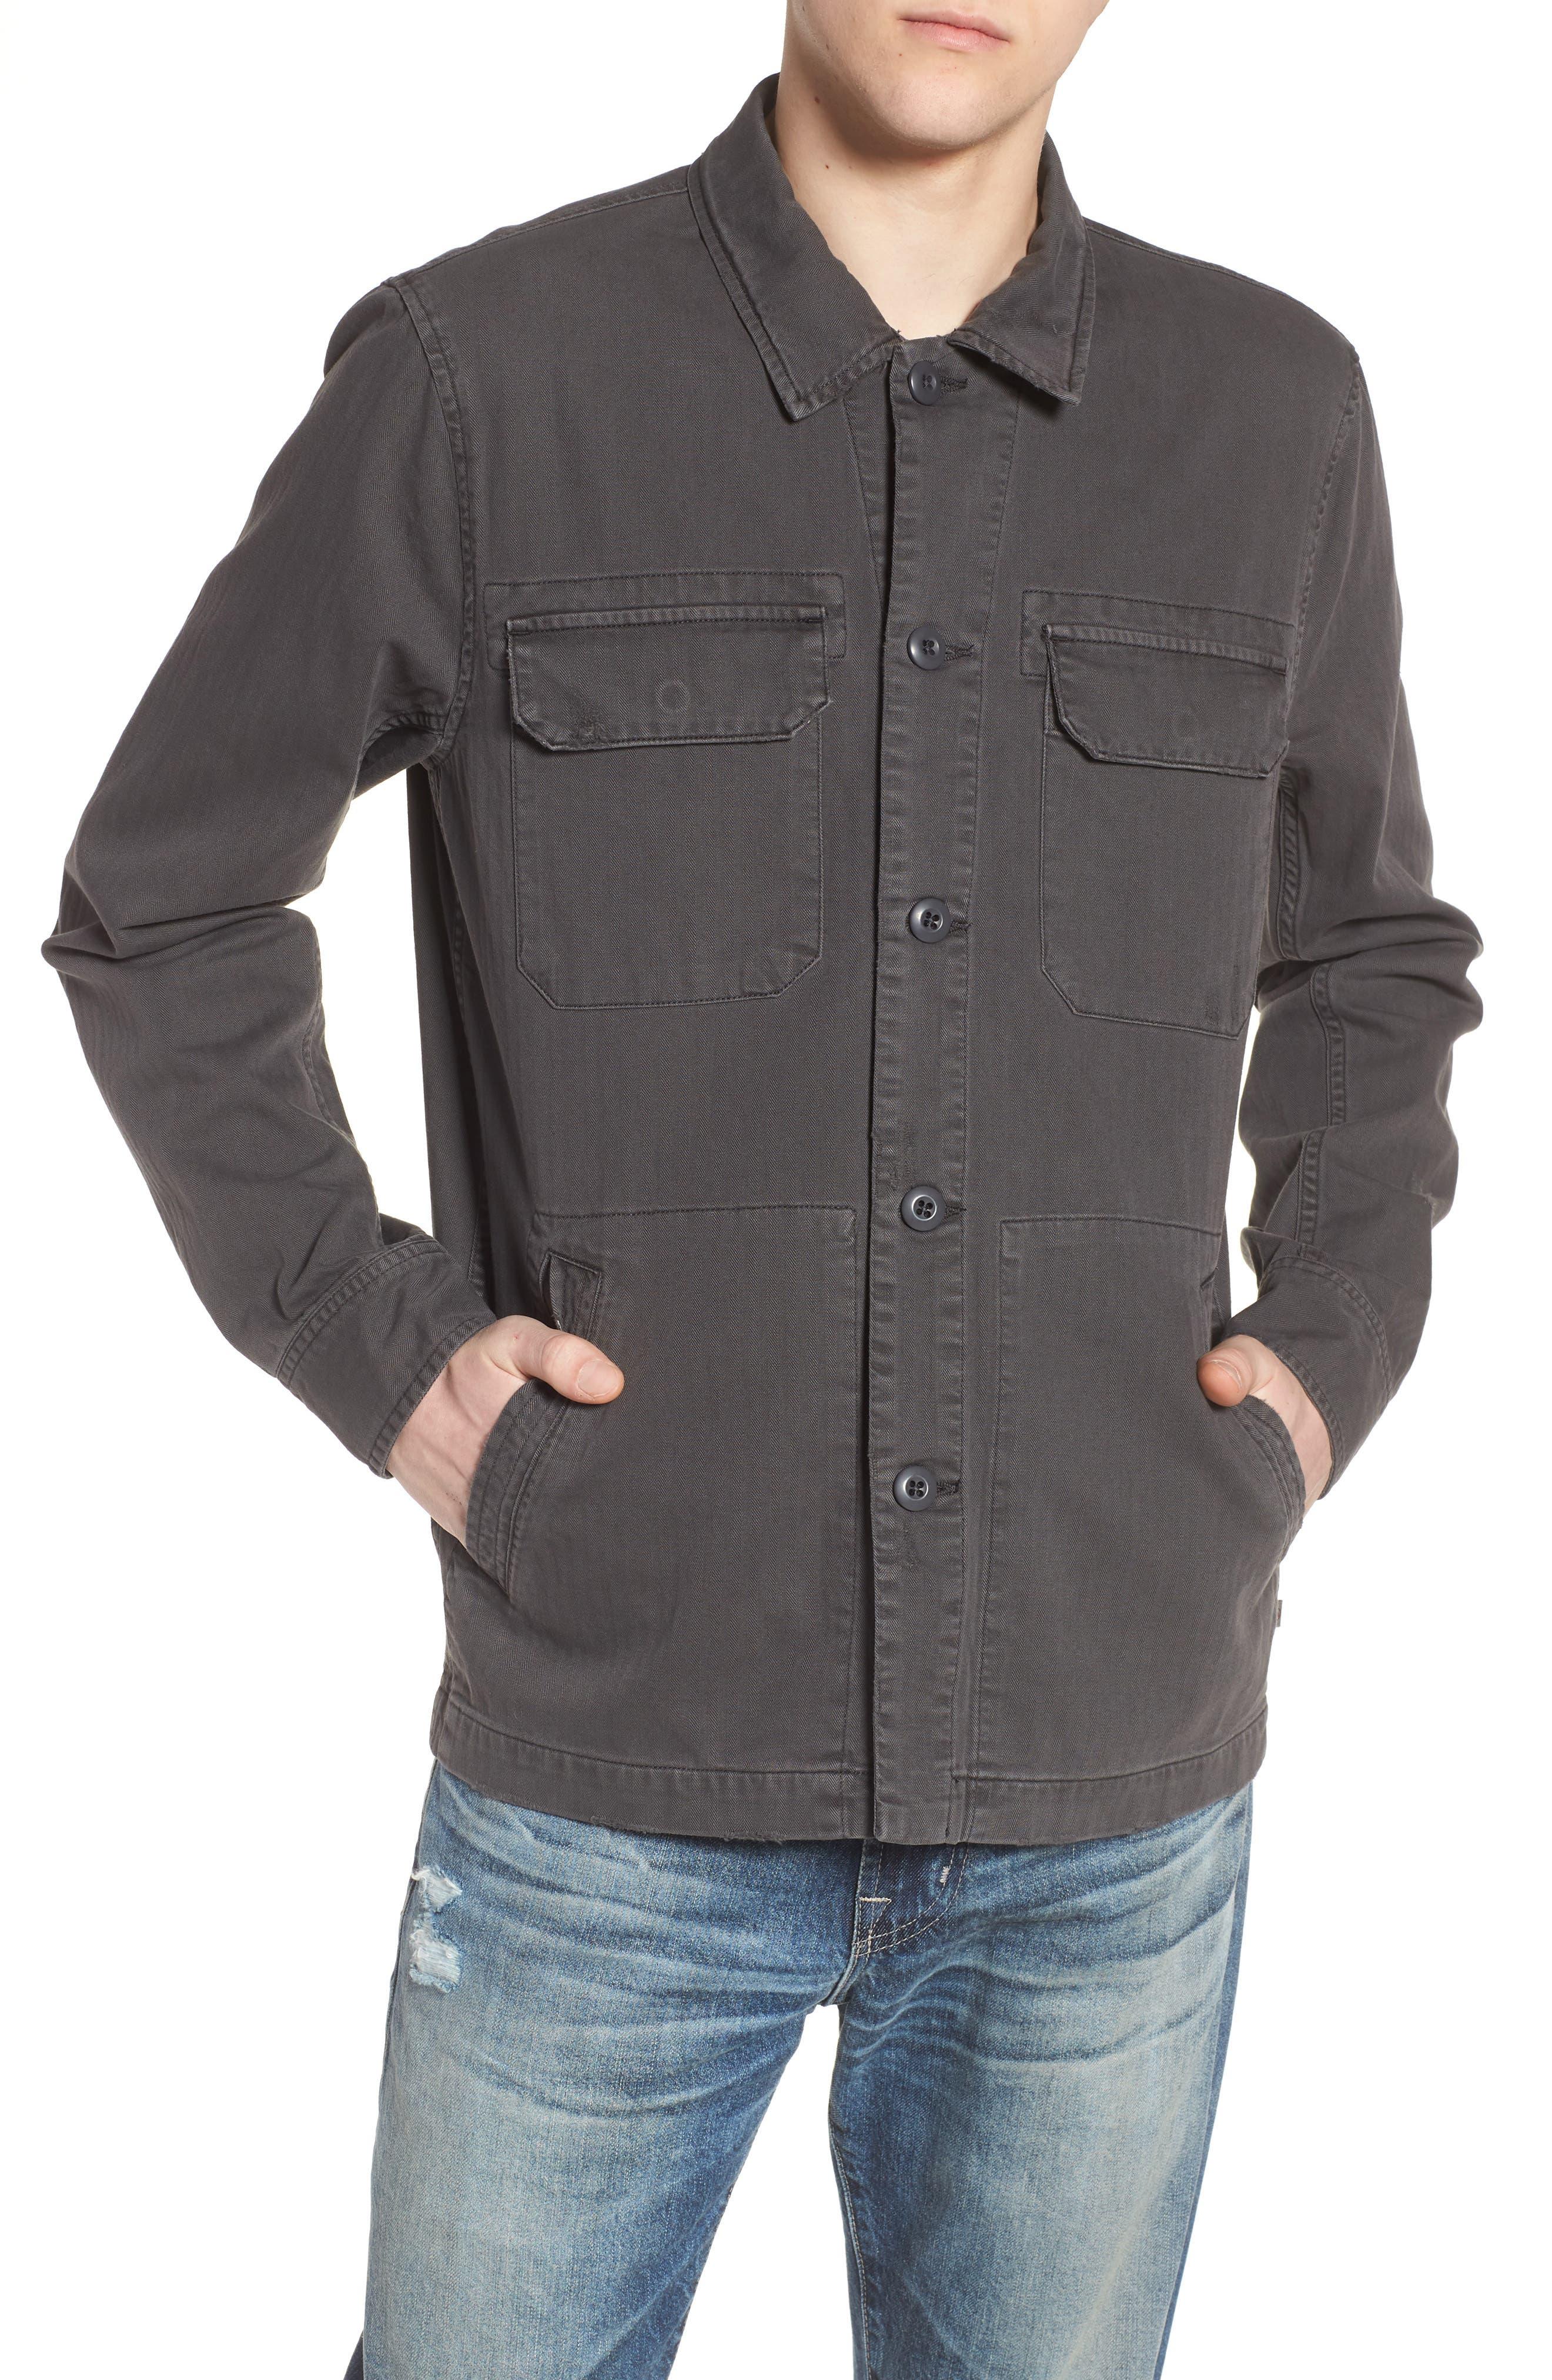 Marx Slim Fit Jacket,                             Alternate thumbnail 4, color,                             5 Years Pigment Smoke Grey